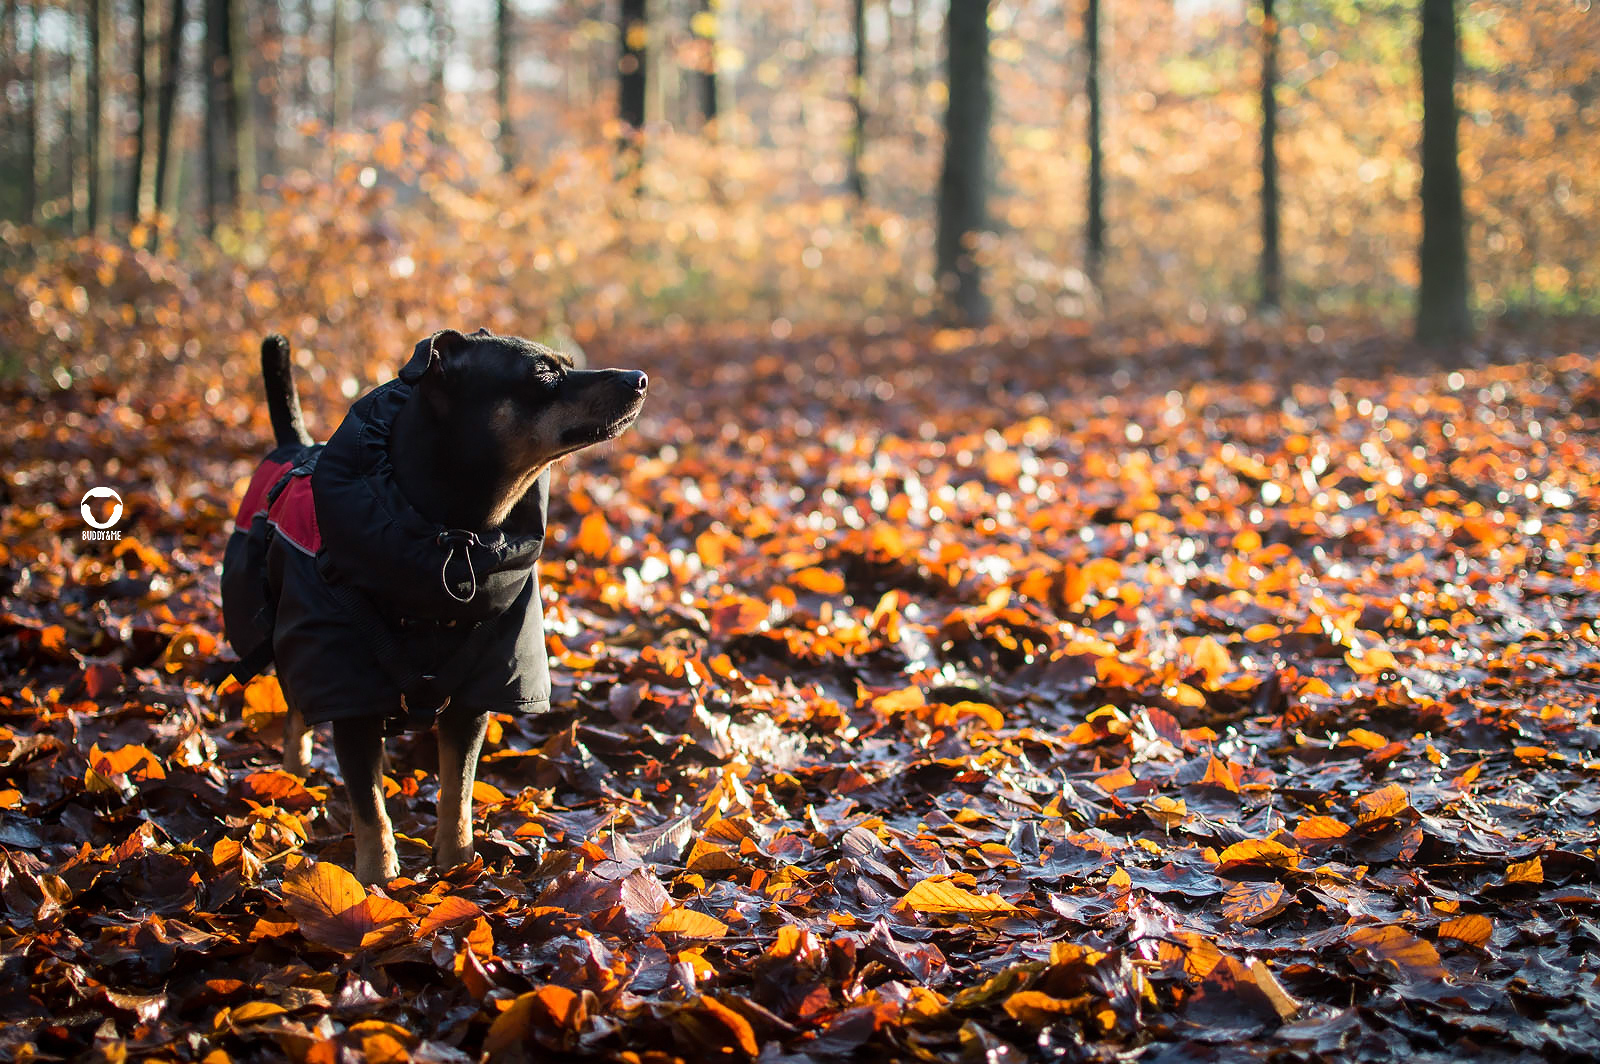 Pinscher Buddy, Buddy and Me, Hundeblog, Dogblog, Ruhrgebiet, Leben mit Hund, Hundealltag